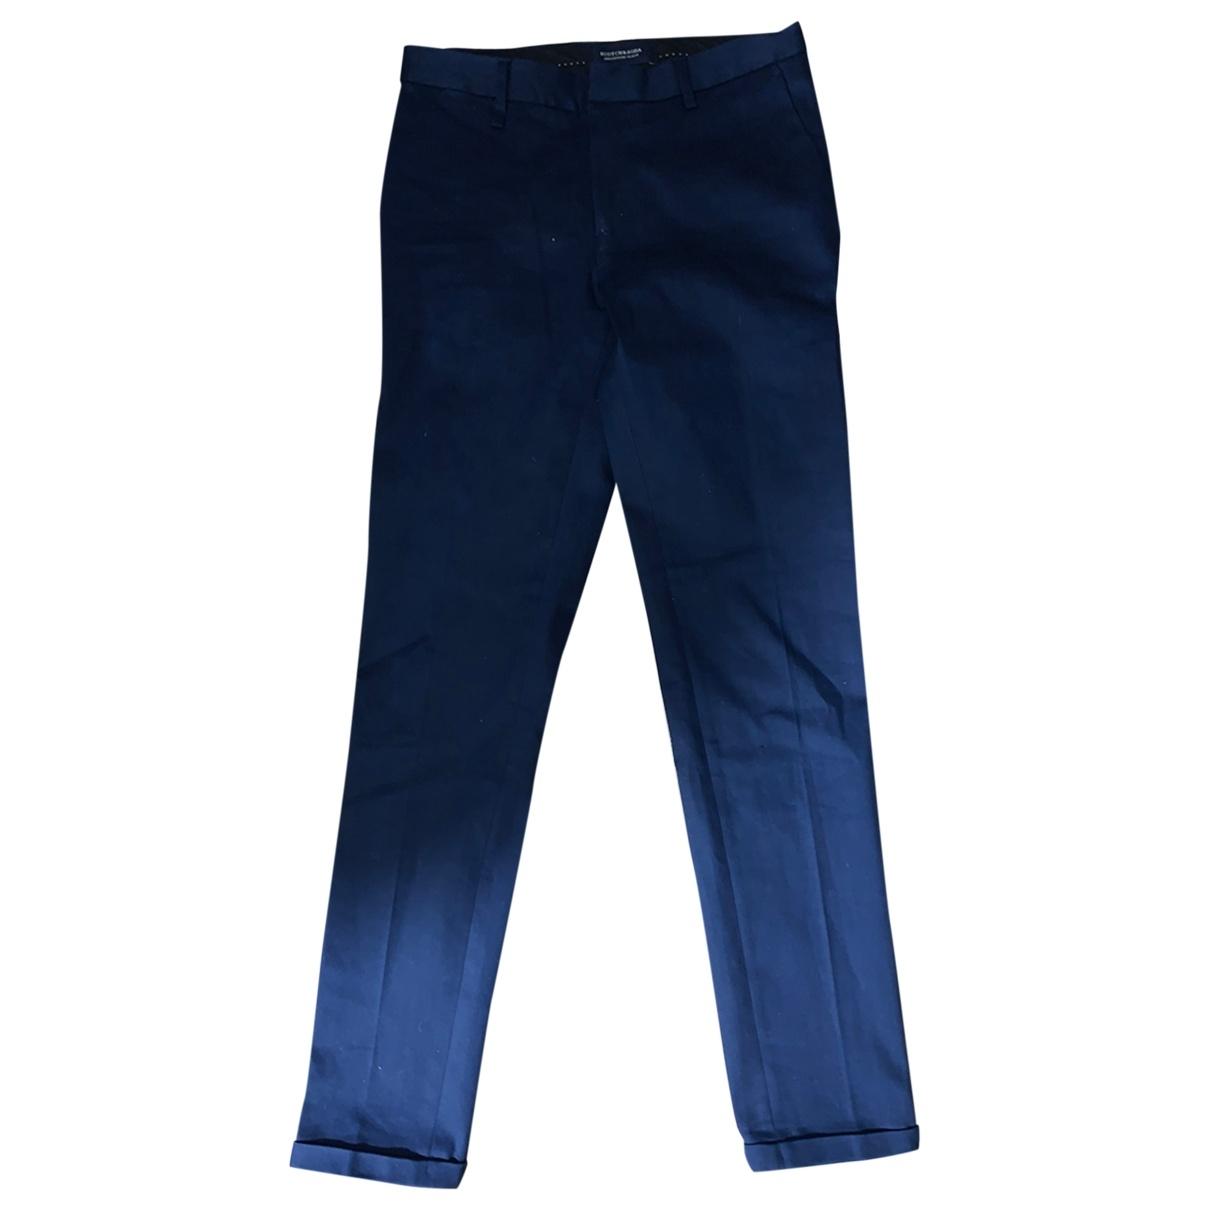 Scotch & Soda \N Navy Wool Trousers for Men 28 UK - US